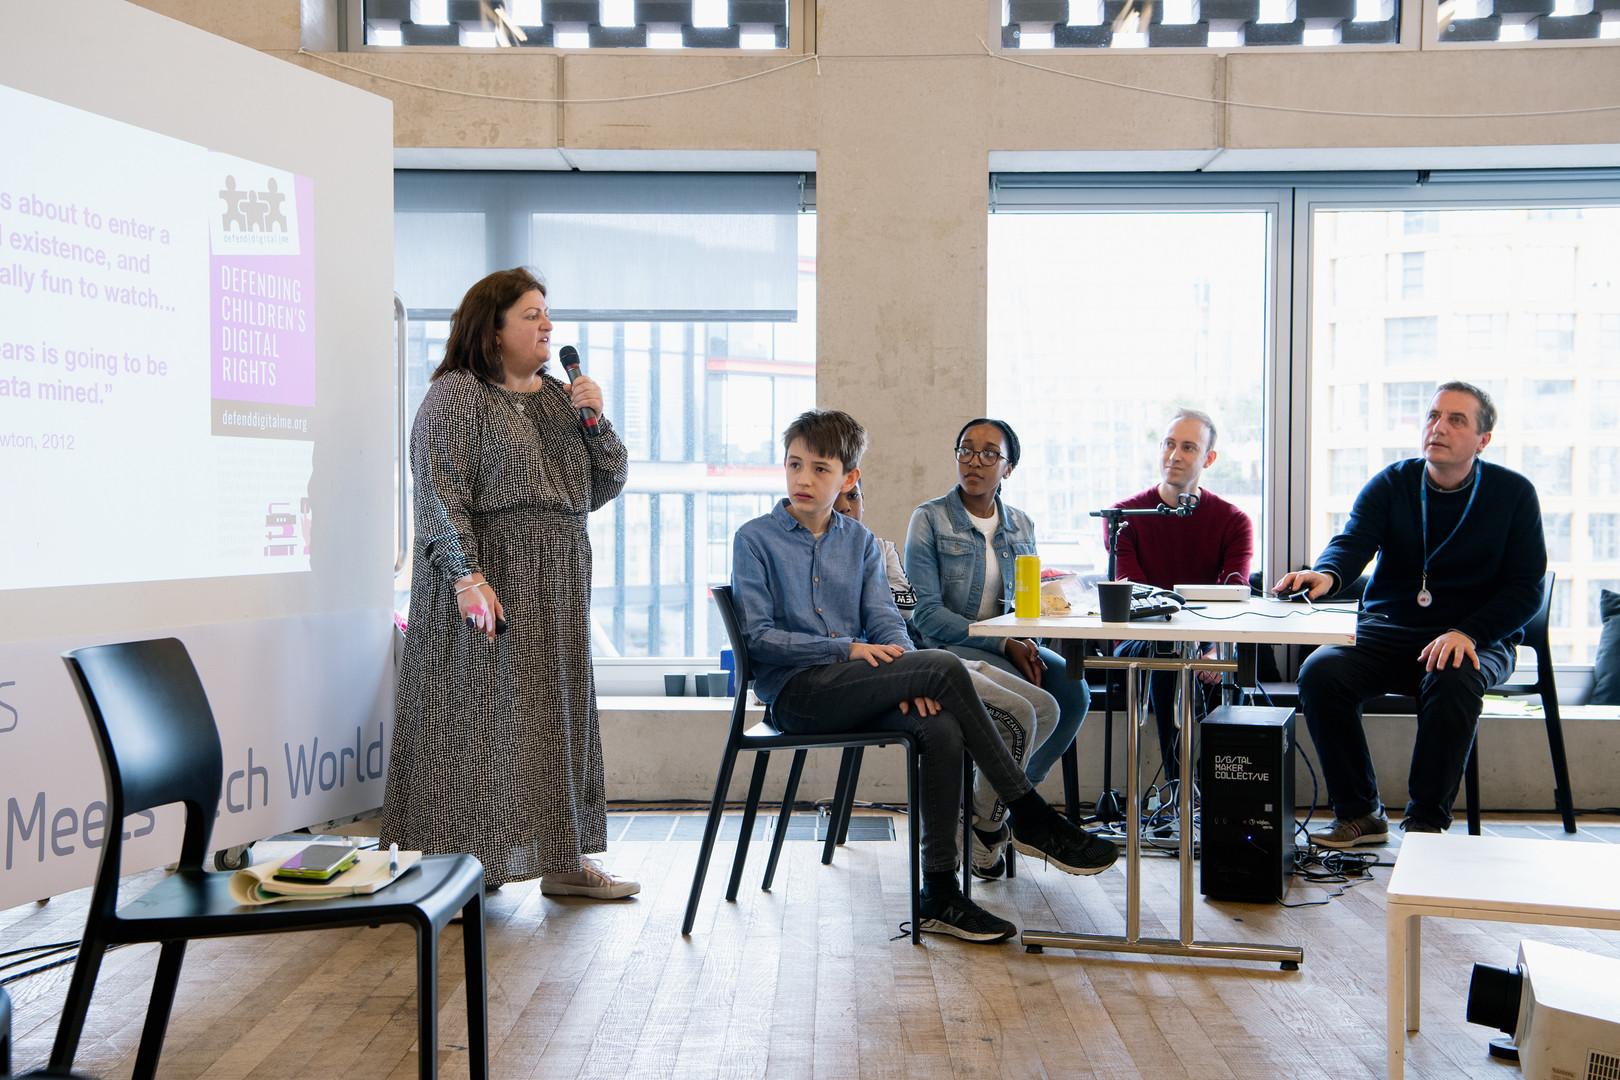 Ethics of Children's Data panel (from left to right: Jen Perrson (DefendDigitalMe), Young Coders Group), Leo Ratledge (CRIN), - Photo: Alex Wojcik